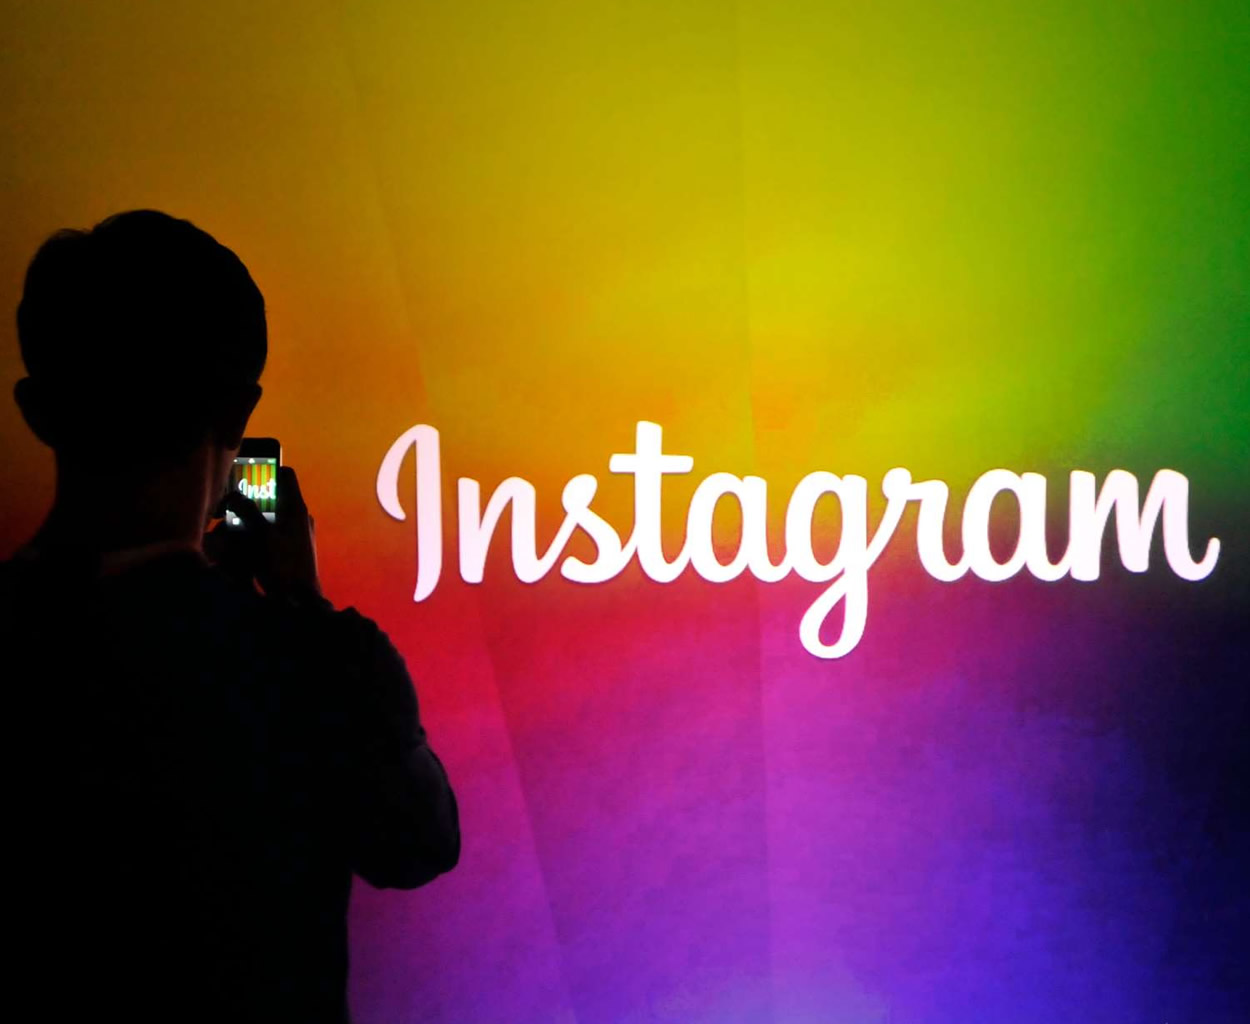 Viral video: 28 κόλπα για να ξεχωρίσετε στο Instagram